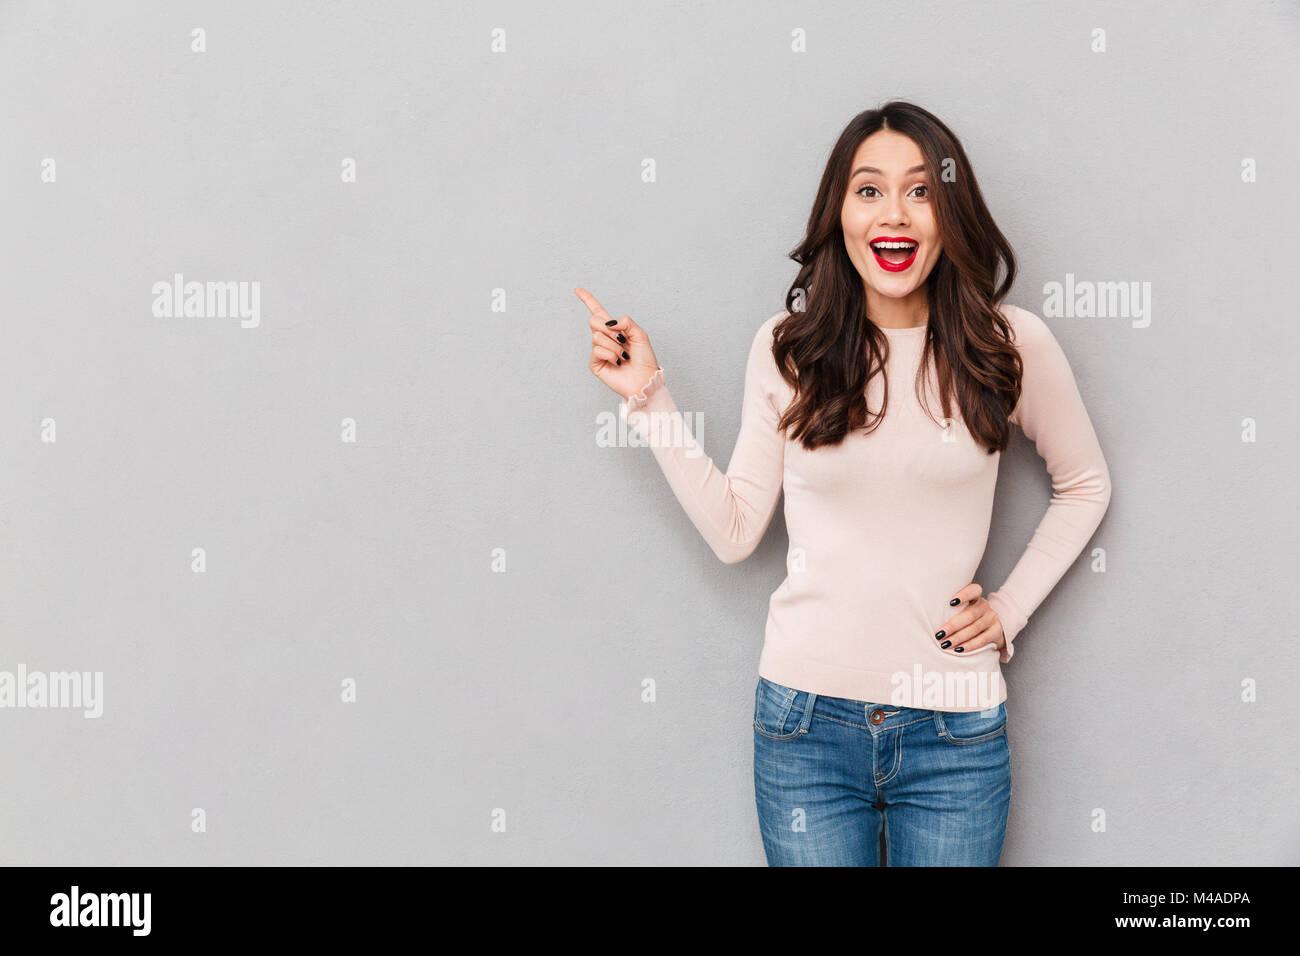 Imagen de bastante emocionado chica con pelo marrón dedo índice que señala a un lado mostrando o Imagen De Stock